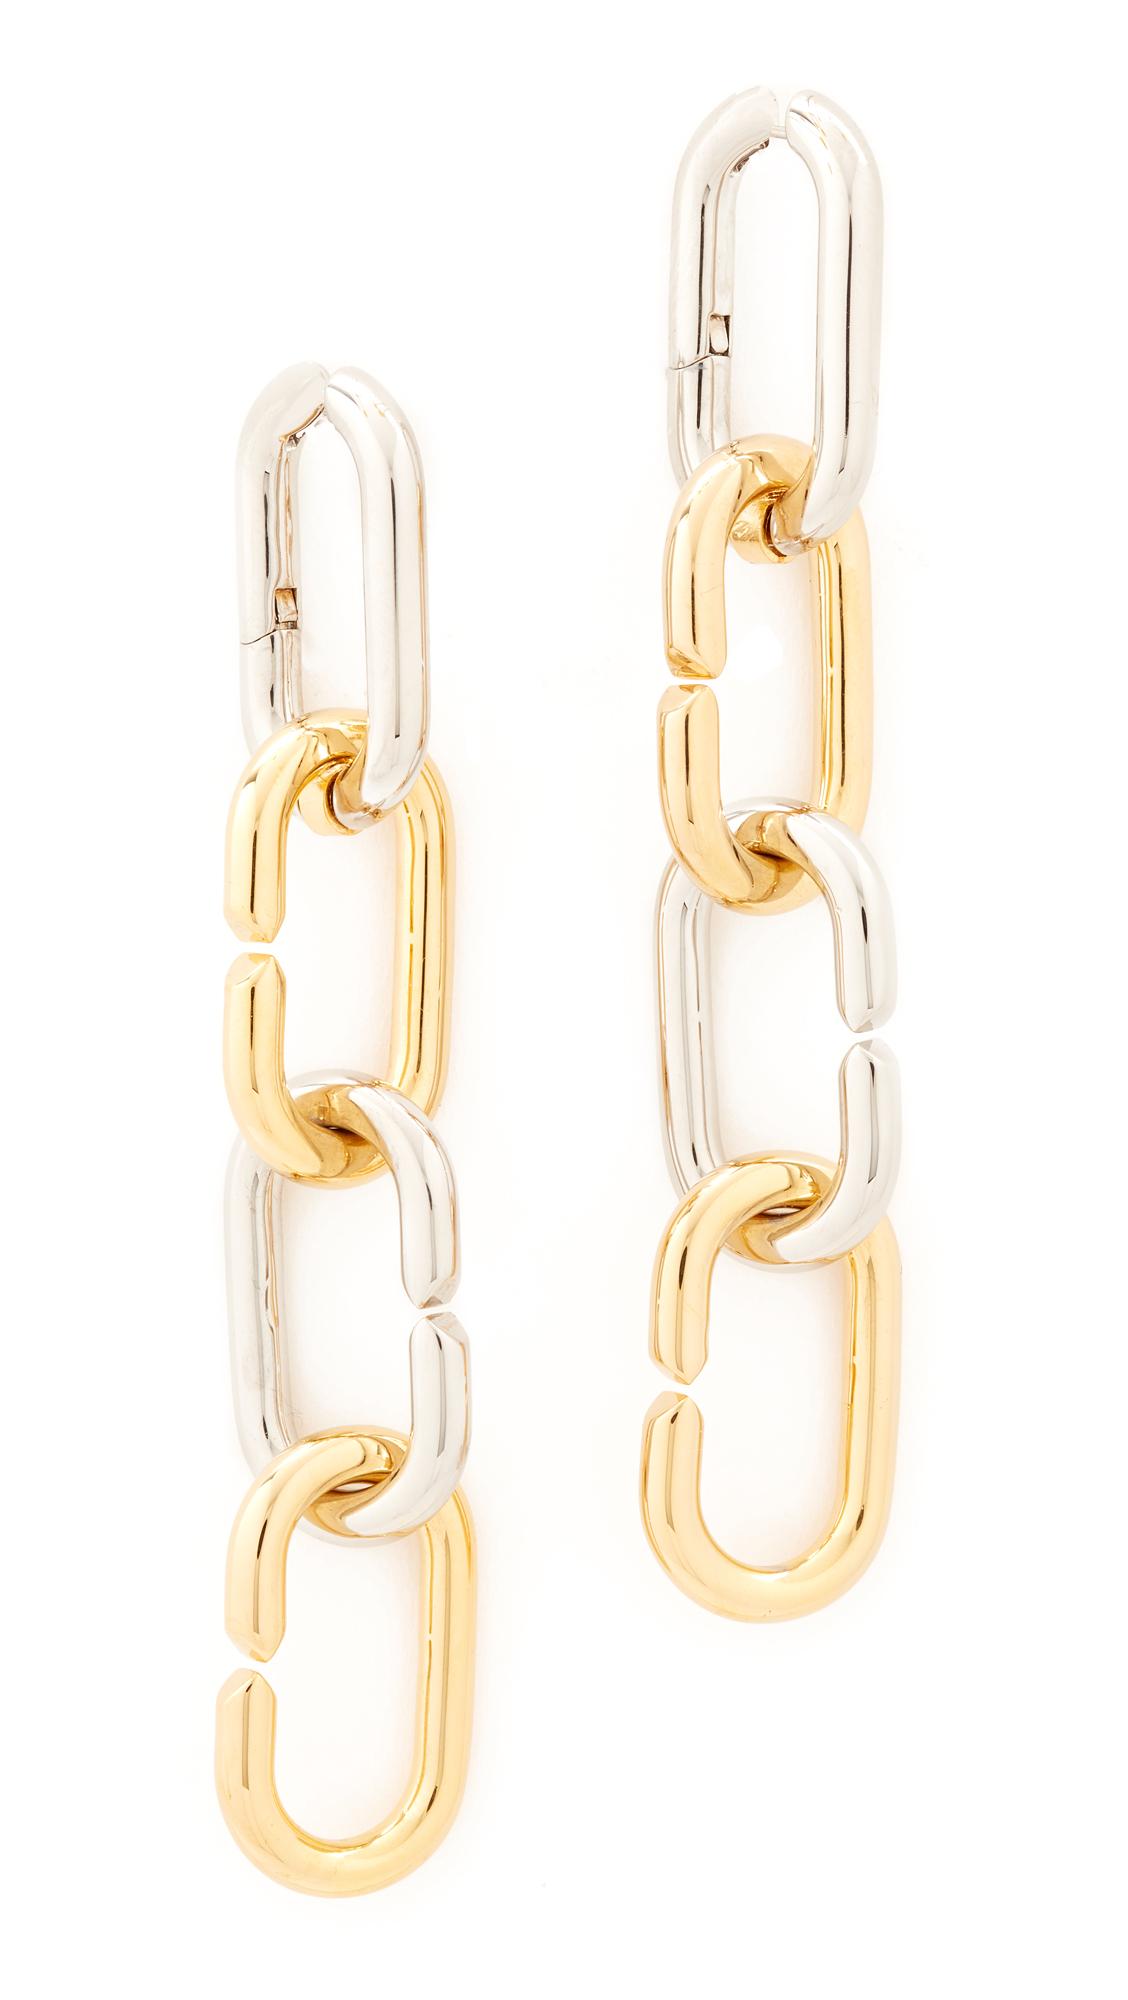 Alexander Wang Broken Link Earrings - Gold/Rhodium